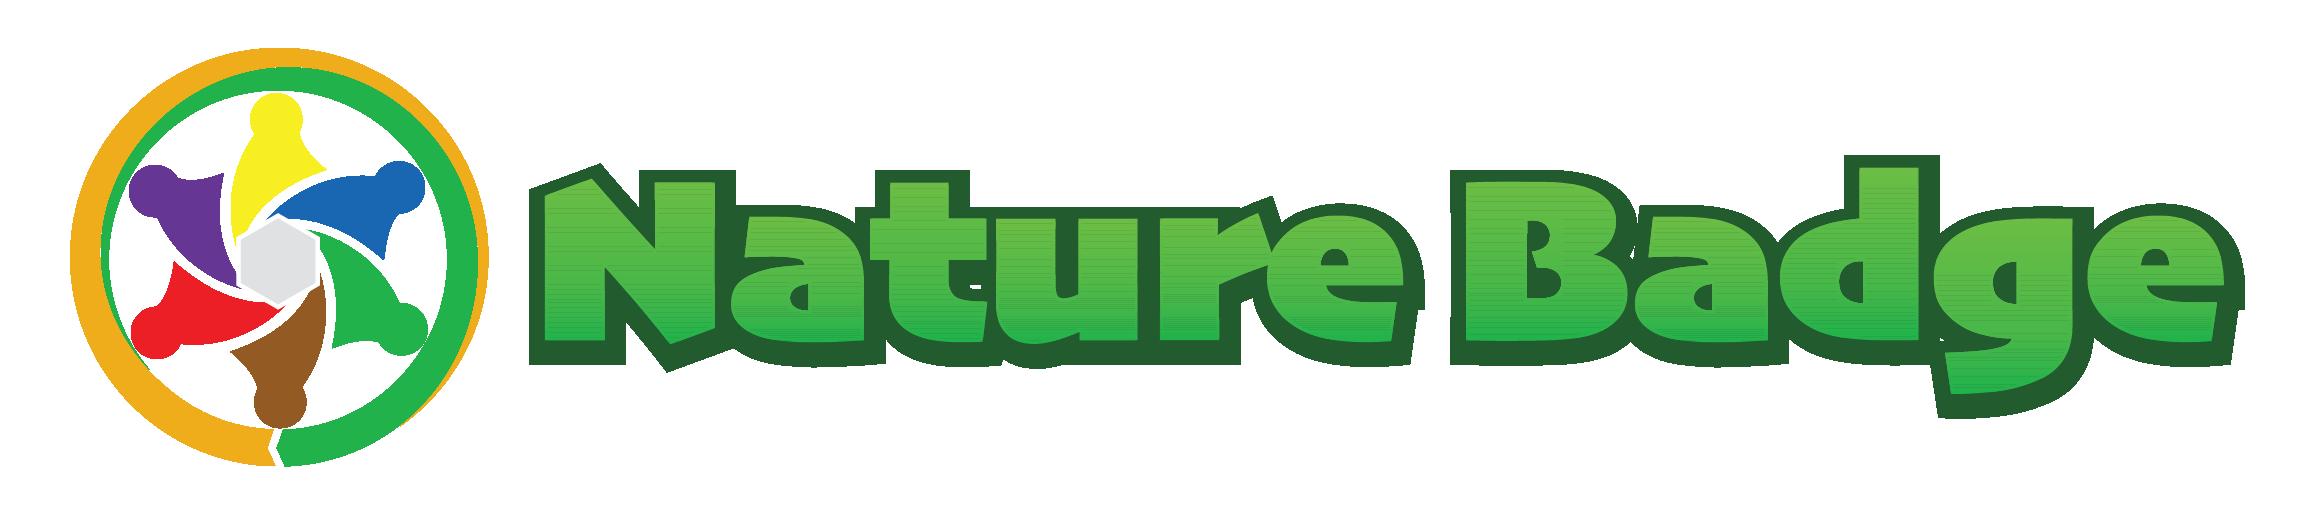 Nature Badge Logo